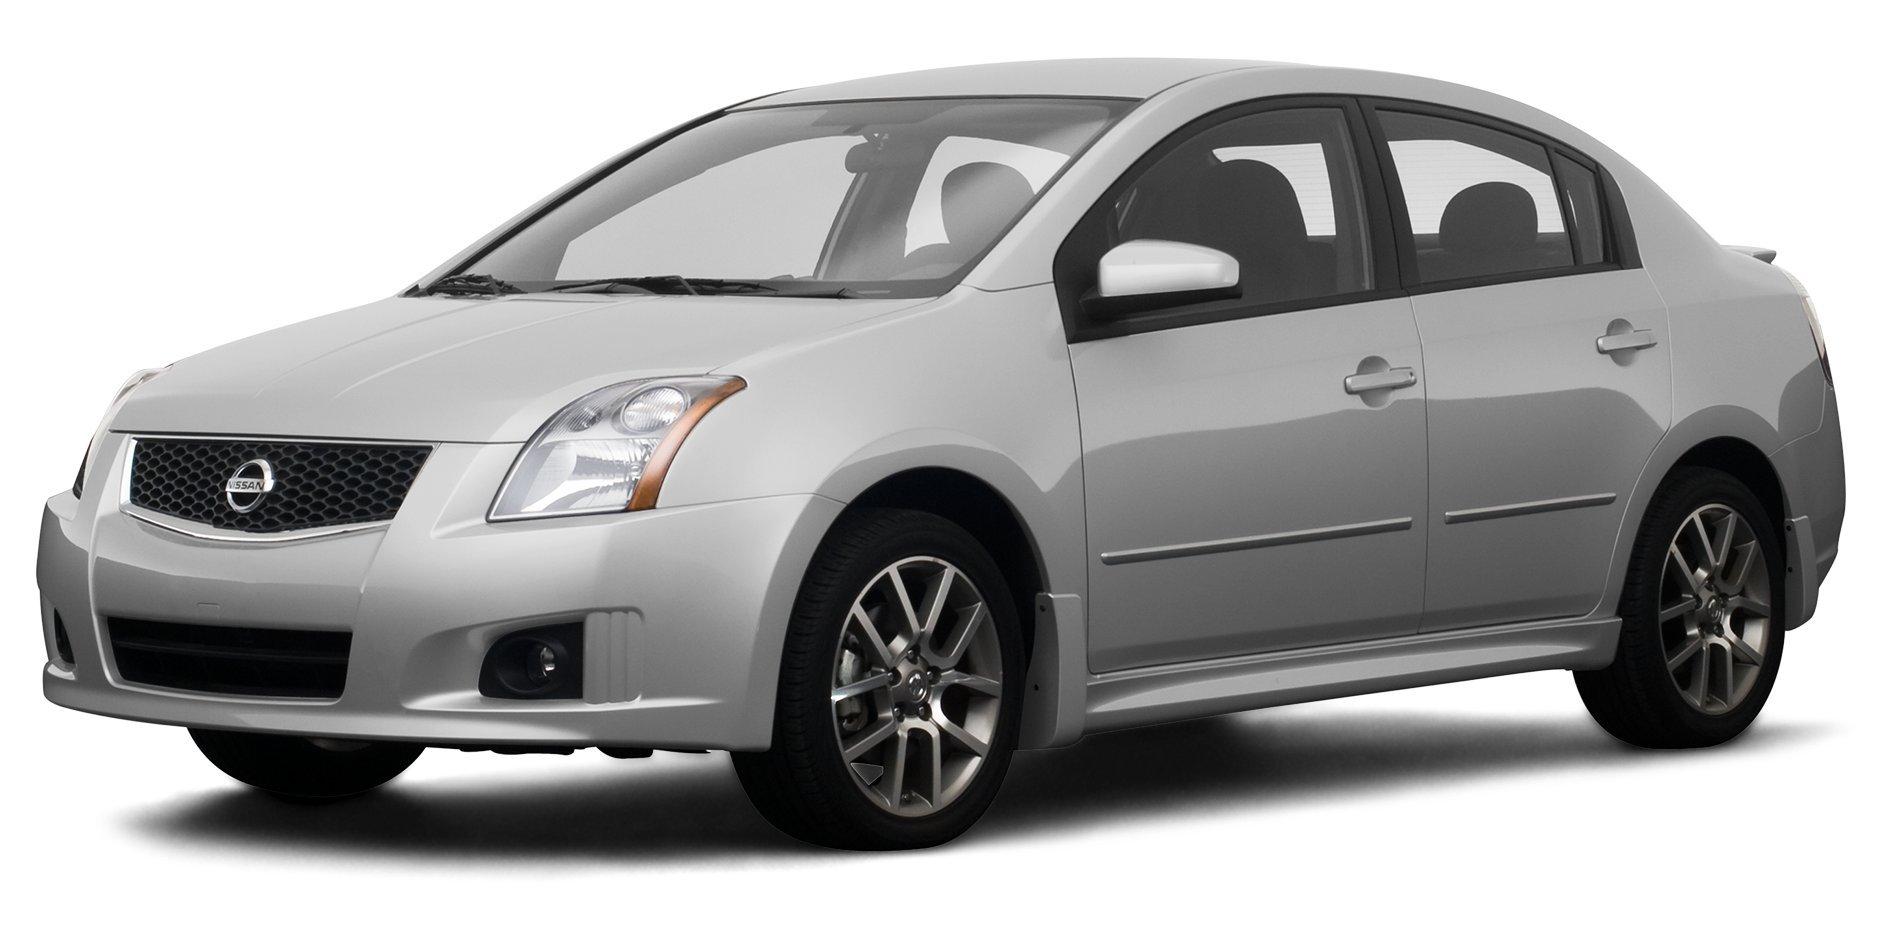 ... 2008 Nissan Sentra SE-R, 4-Door Sedan 4-Cylinder CVT ...